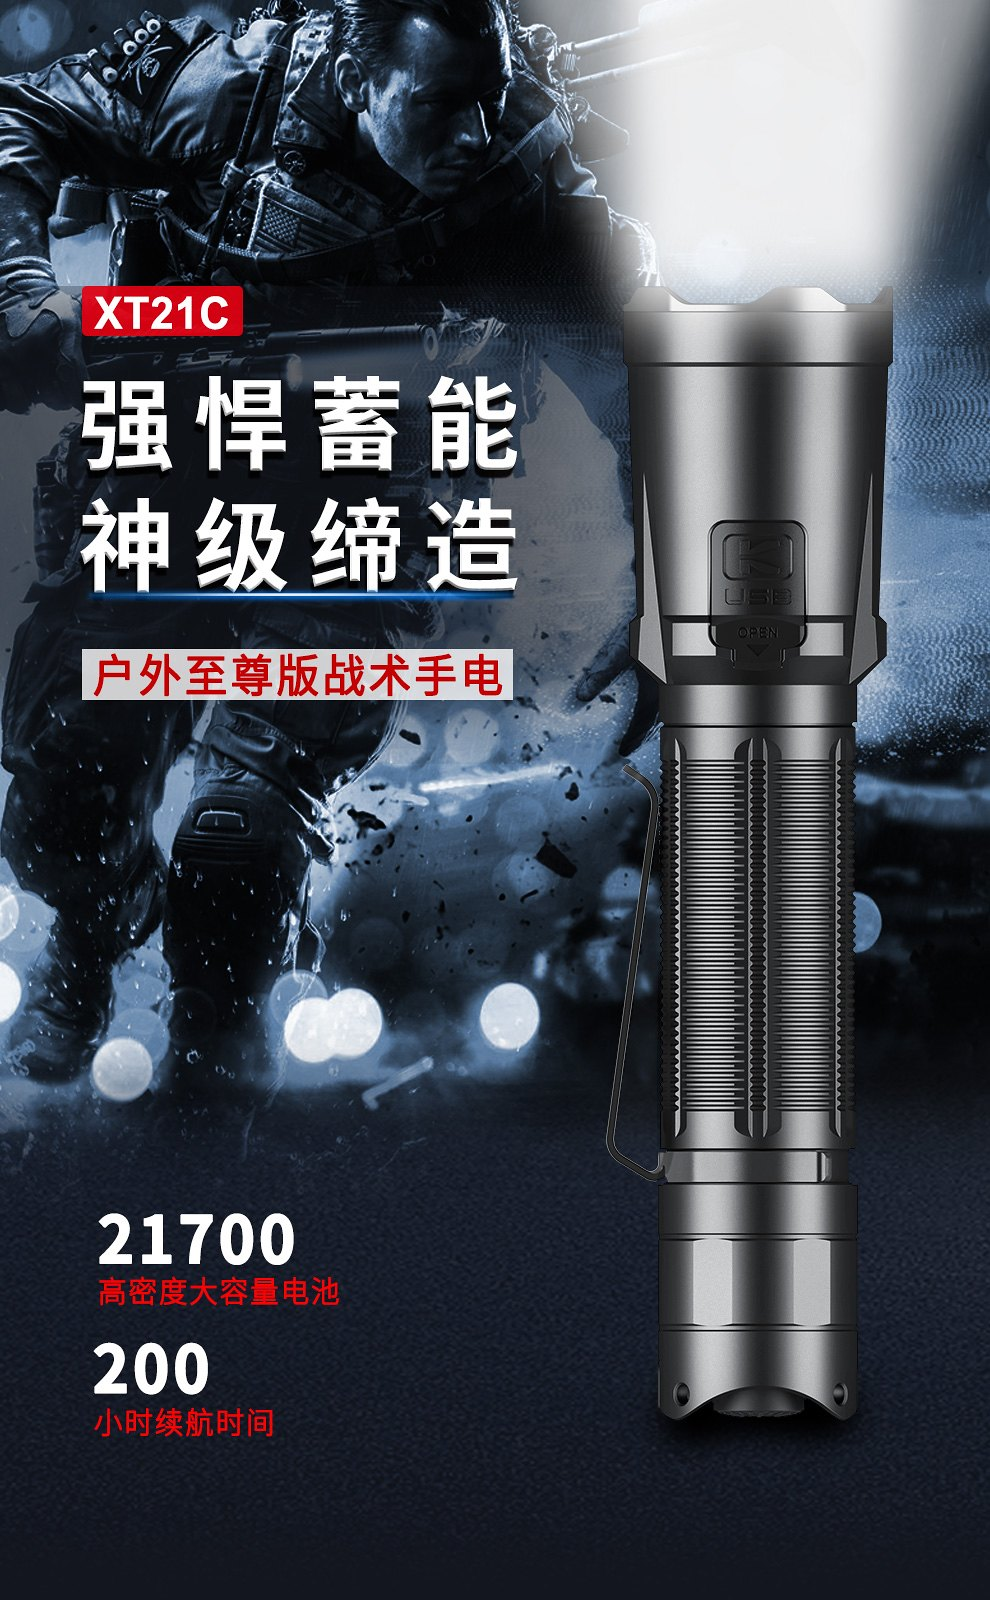 KLARUS XT21C 戰術手電筒 3200流明 -1